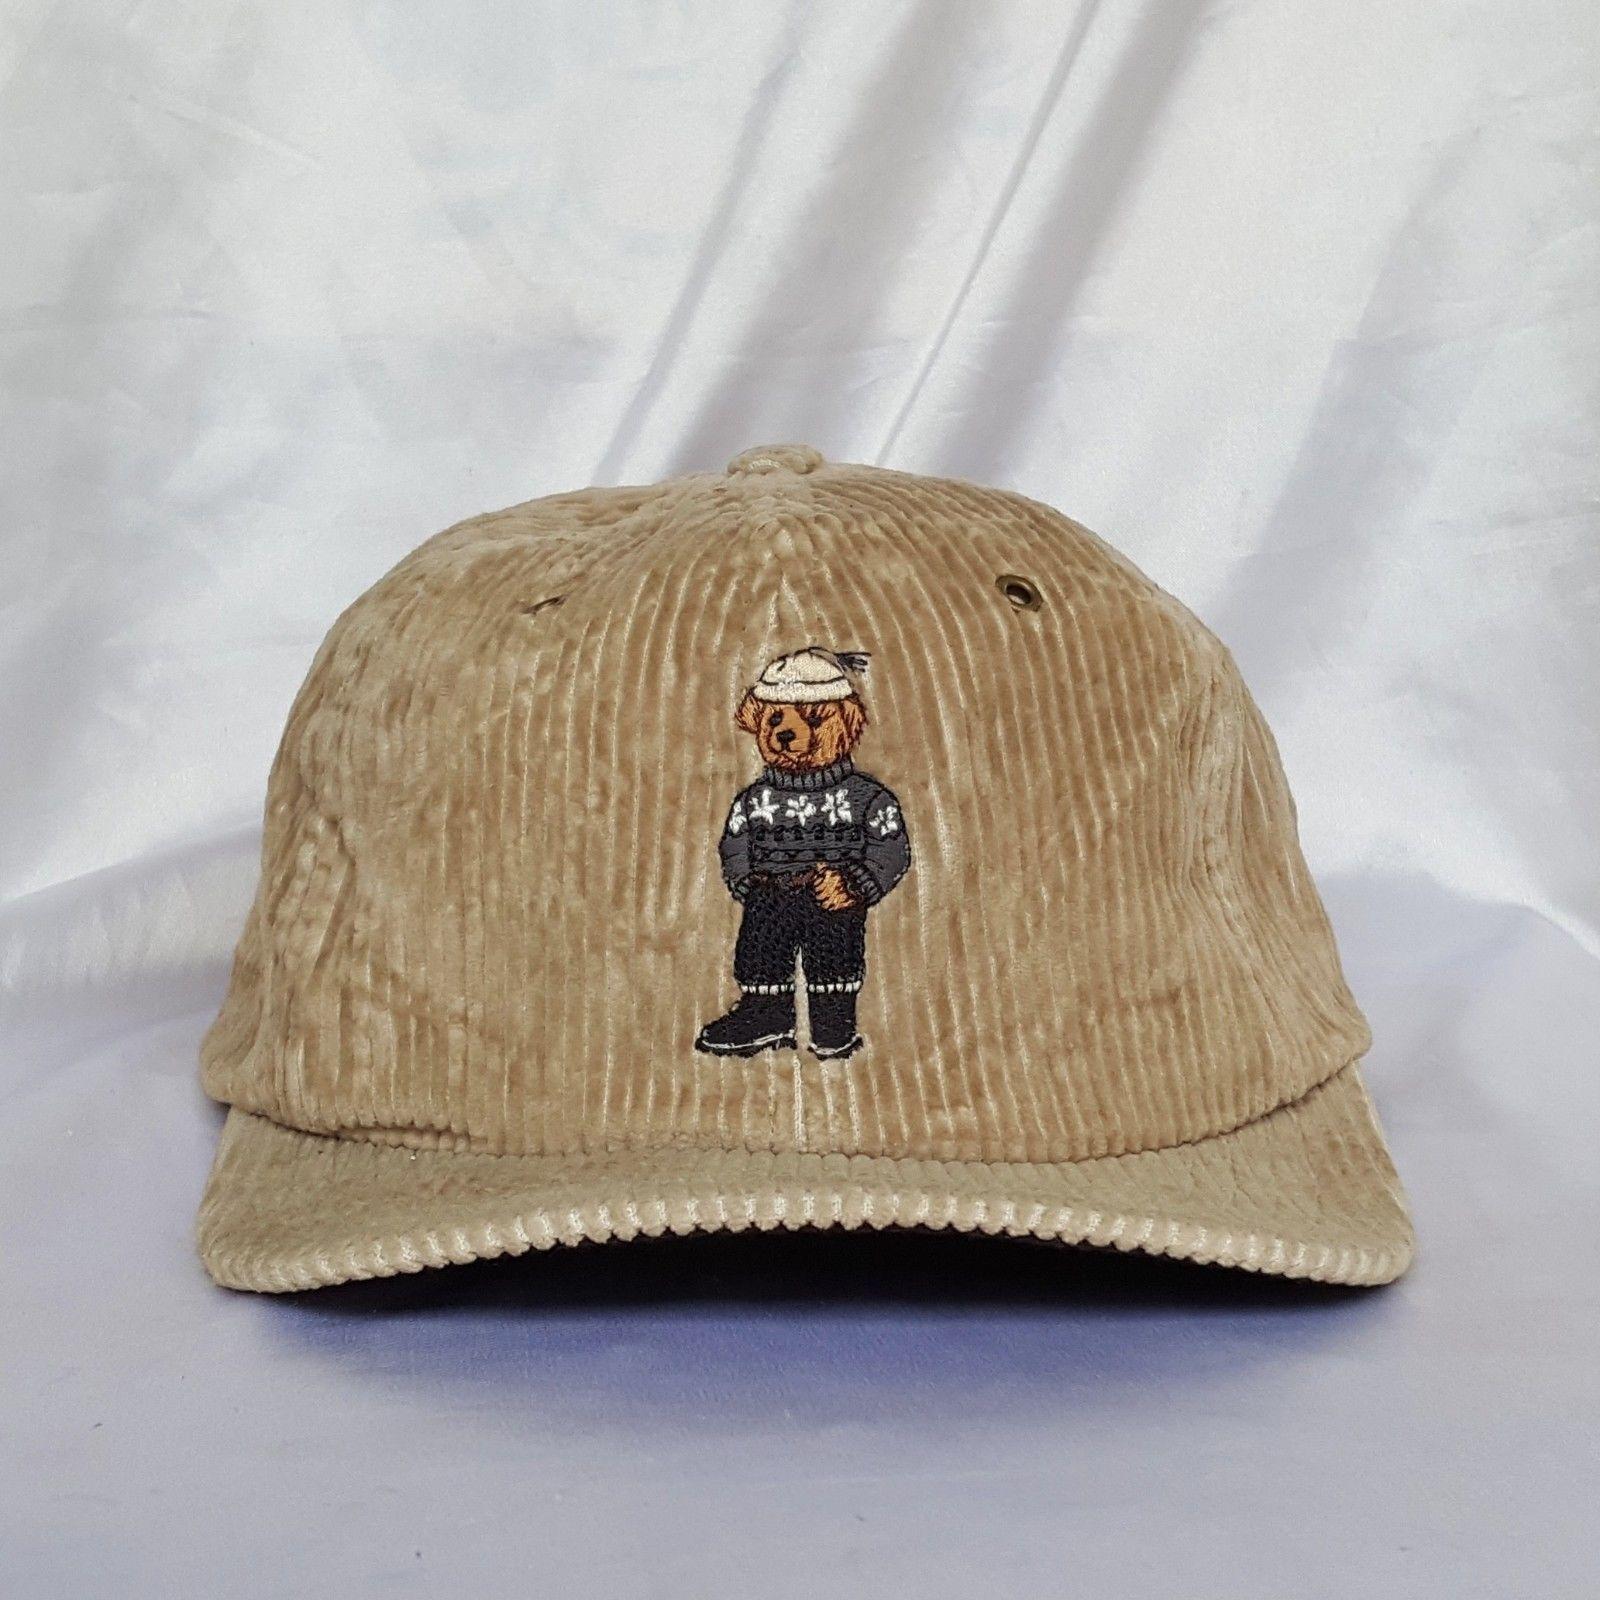 9ed9c0b25 Pin by nikki 🆒🦈🔭🔪 on hats | Baseball hats, Polo sport ralph ...